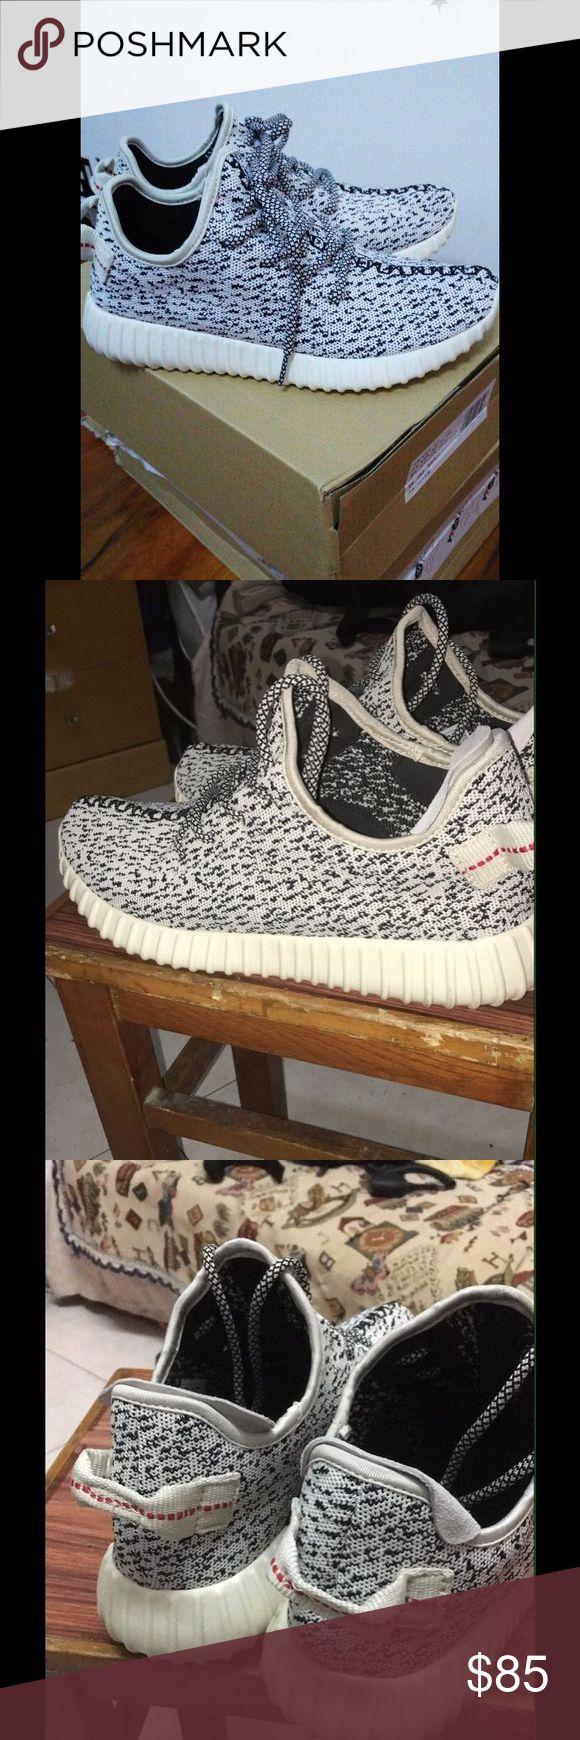 shiekh shoes yeezy boost 350 02/24/16 yeezy boost 350 black market